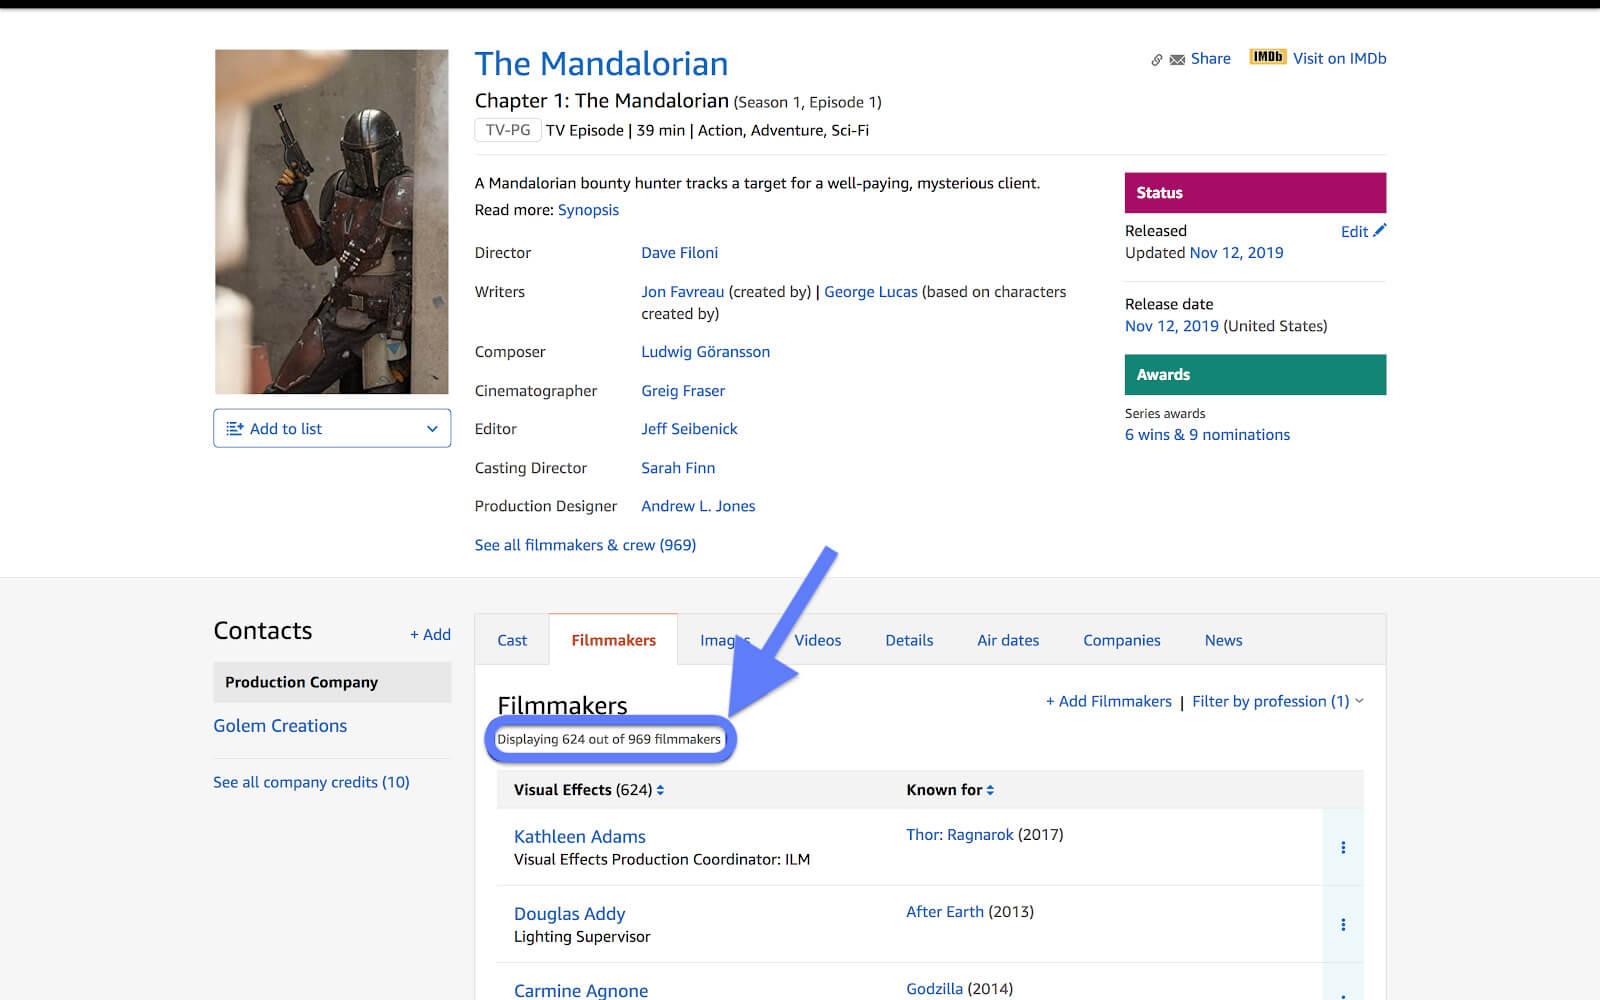 The Mandalorian crew list - Visual effects department